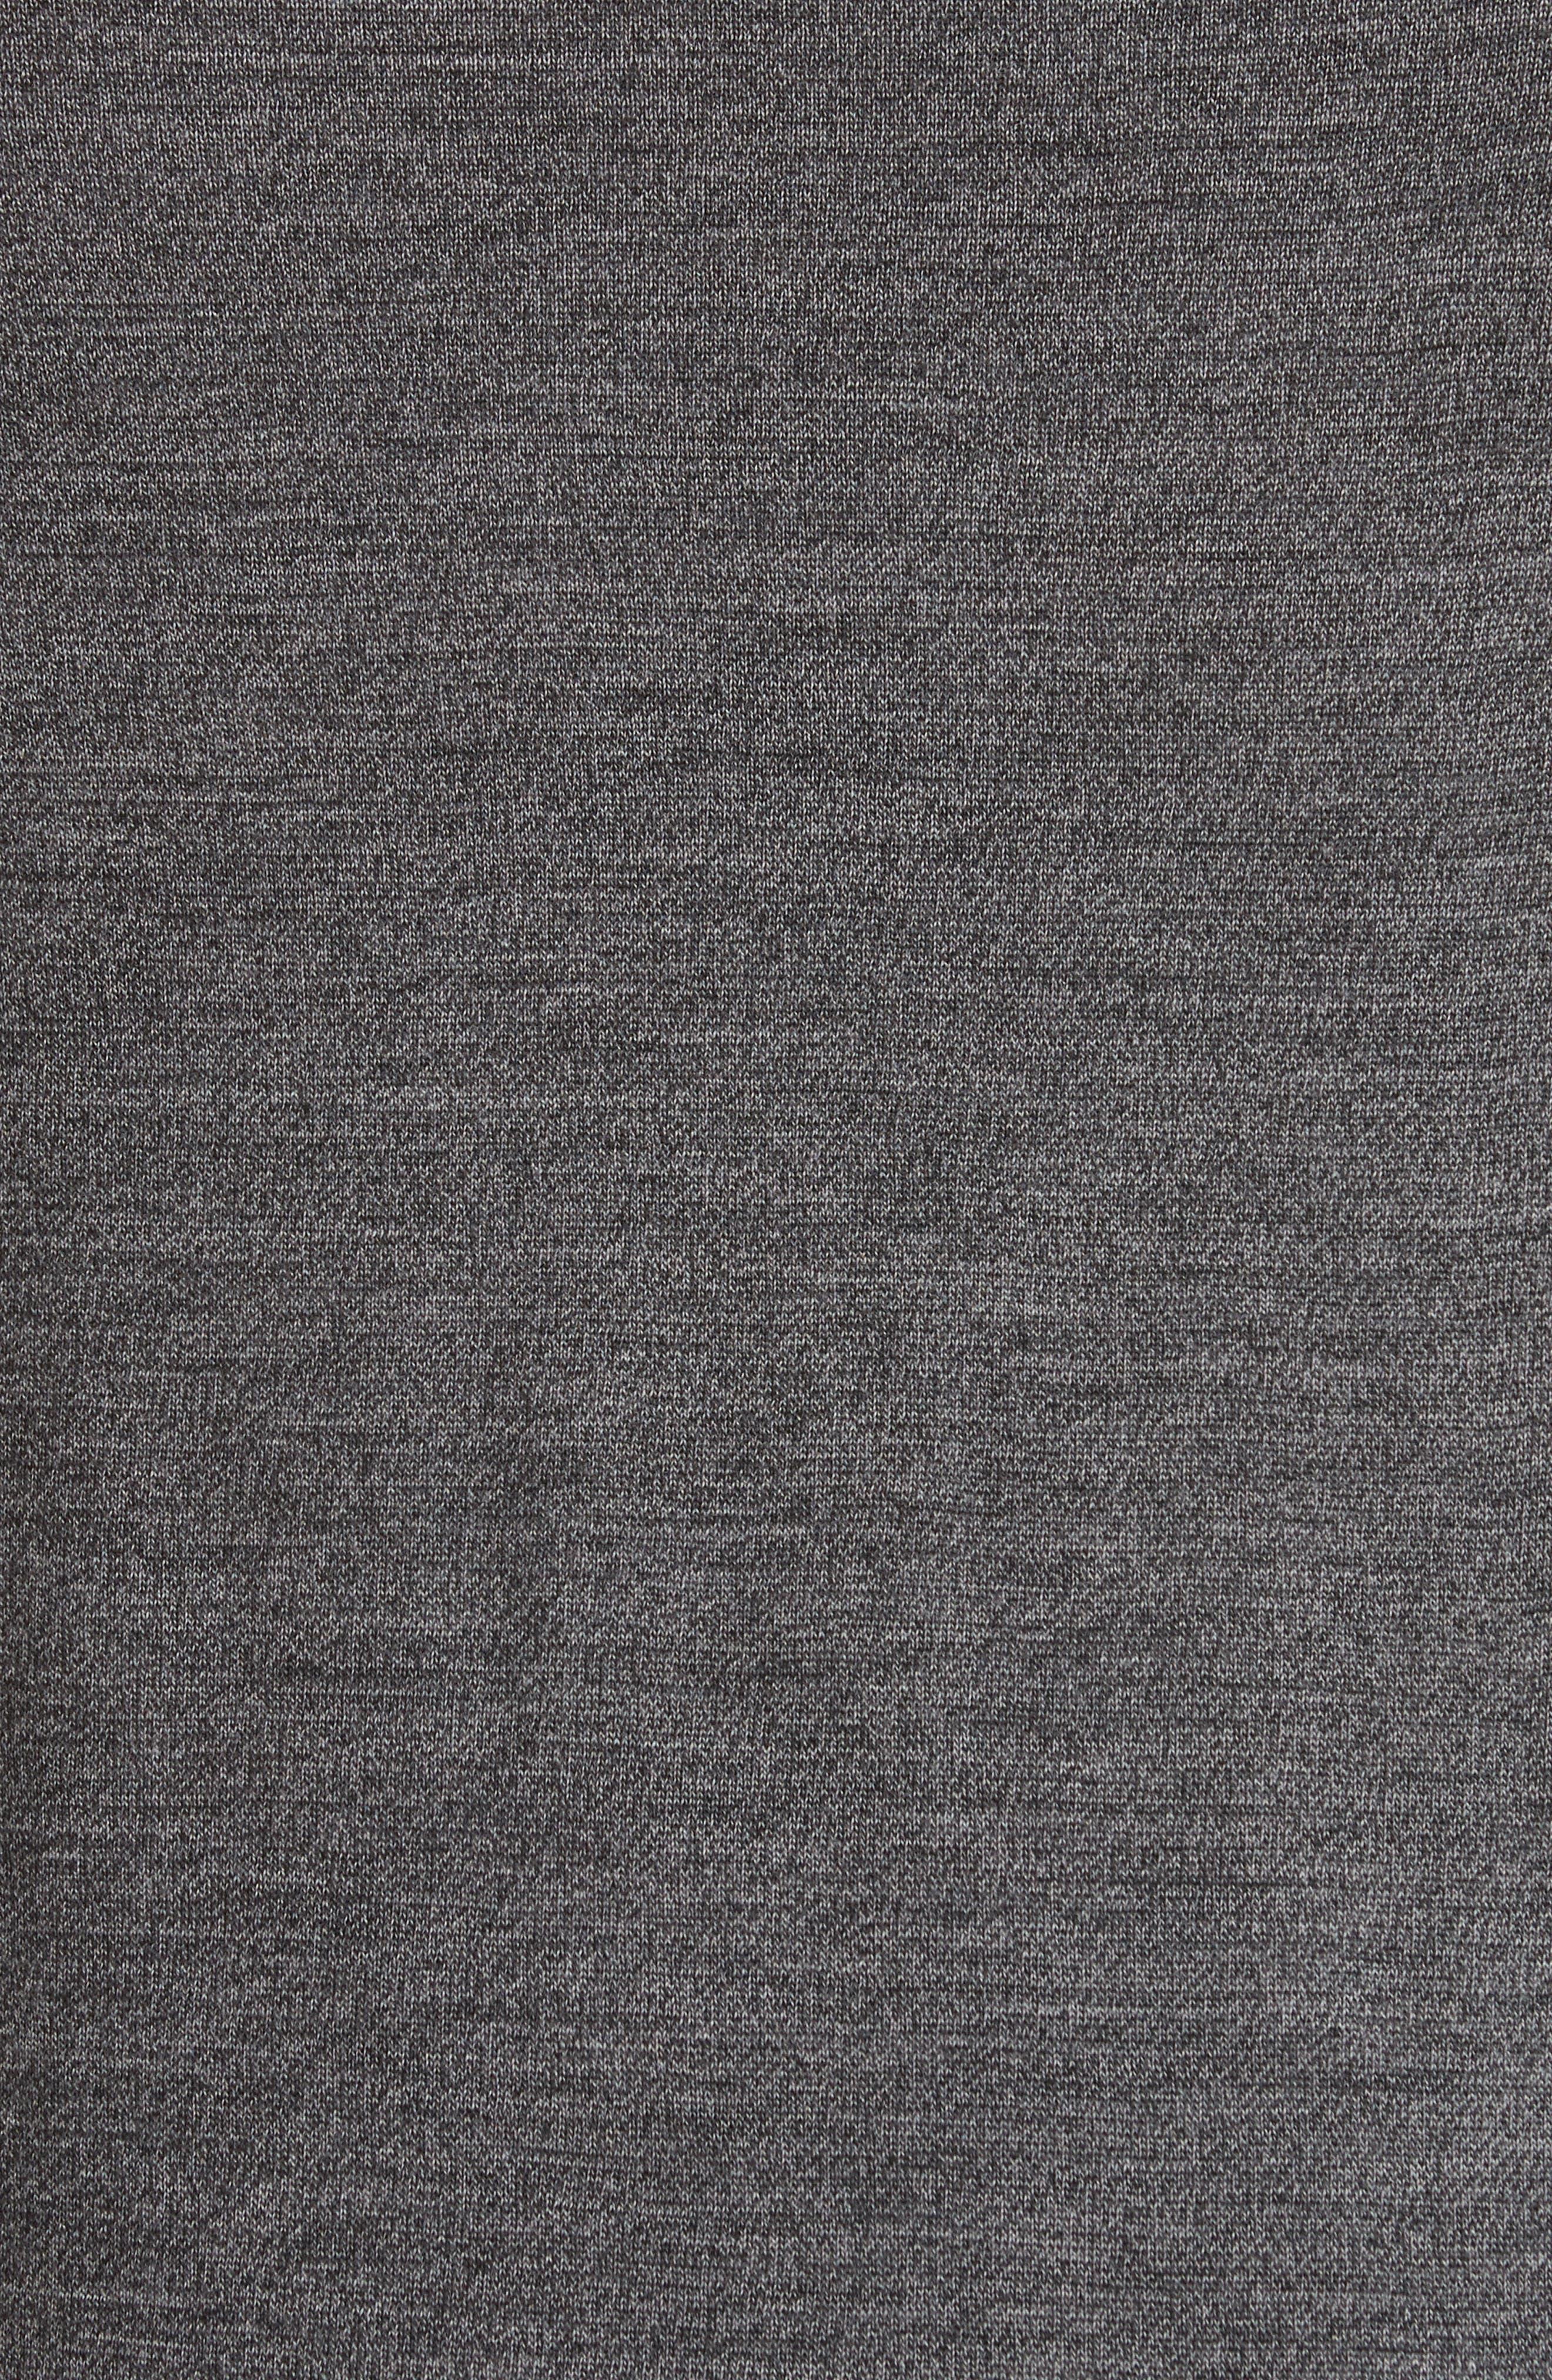 Crewneck Merino Wool Blend Sweater,                             Alternate thumbnail 5, color,                             021